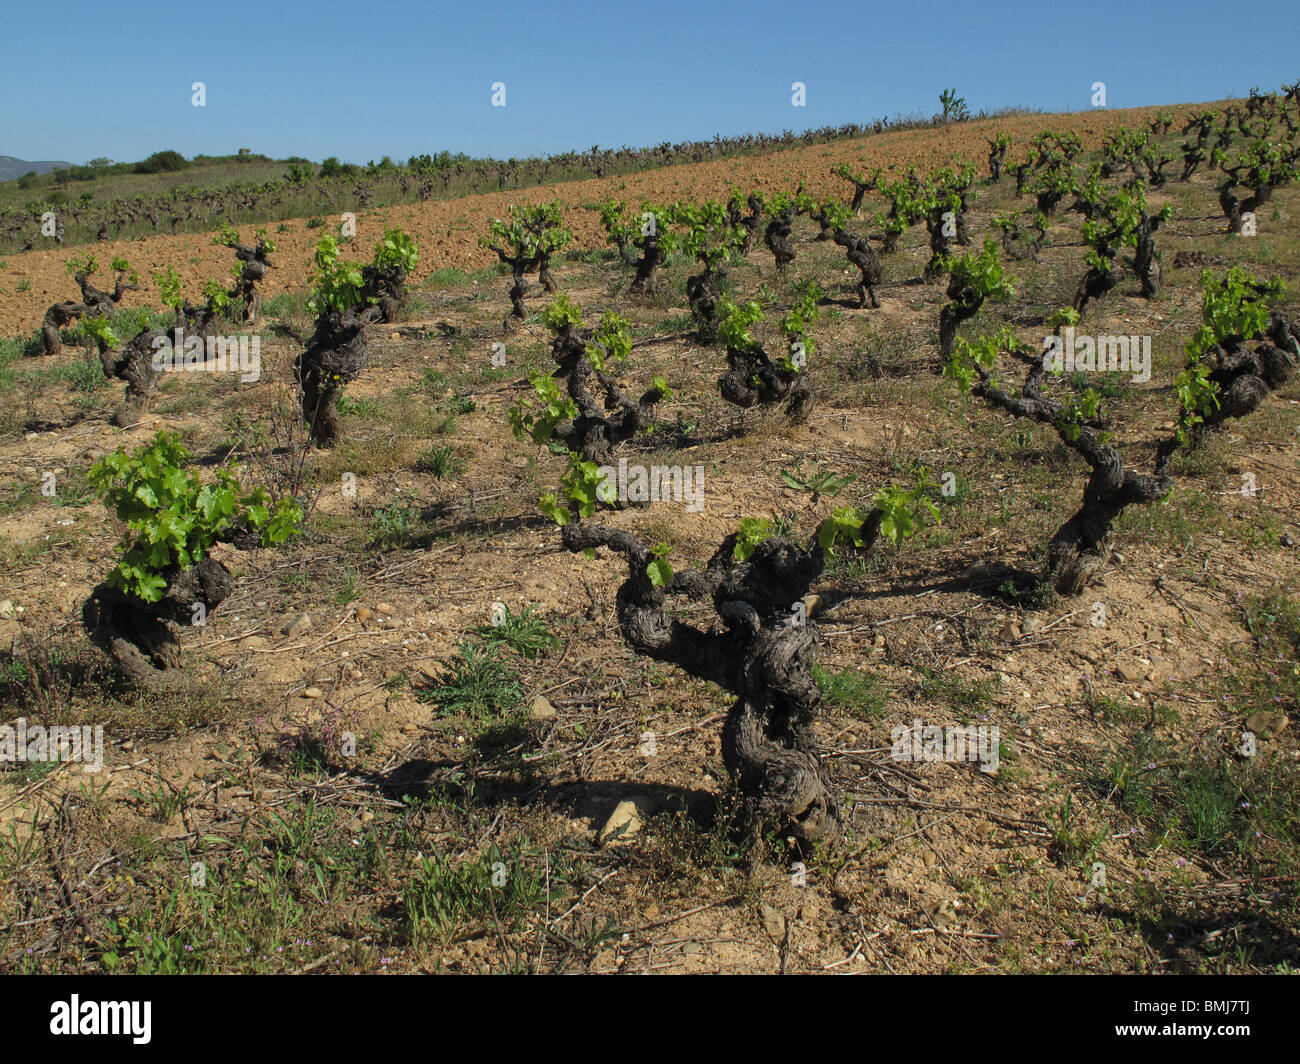 Vineyards in El Bierzo area. Leon province. Spain - Stock Image